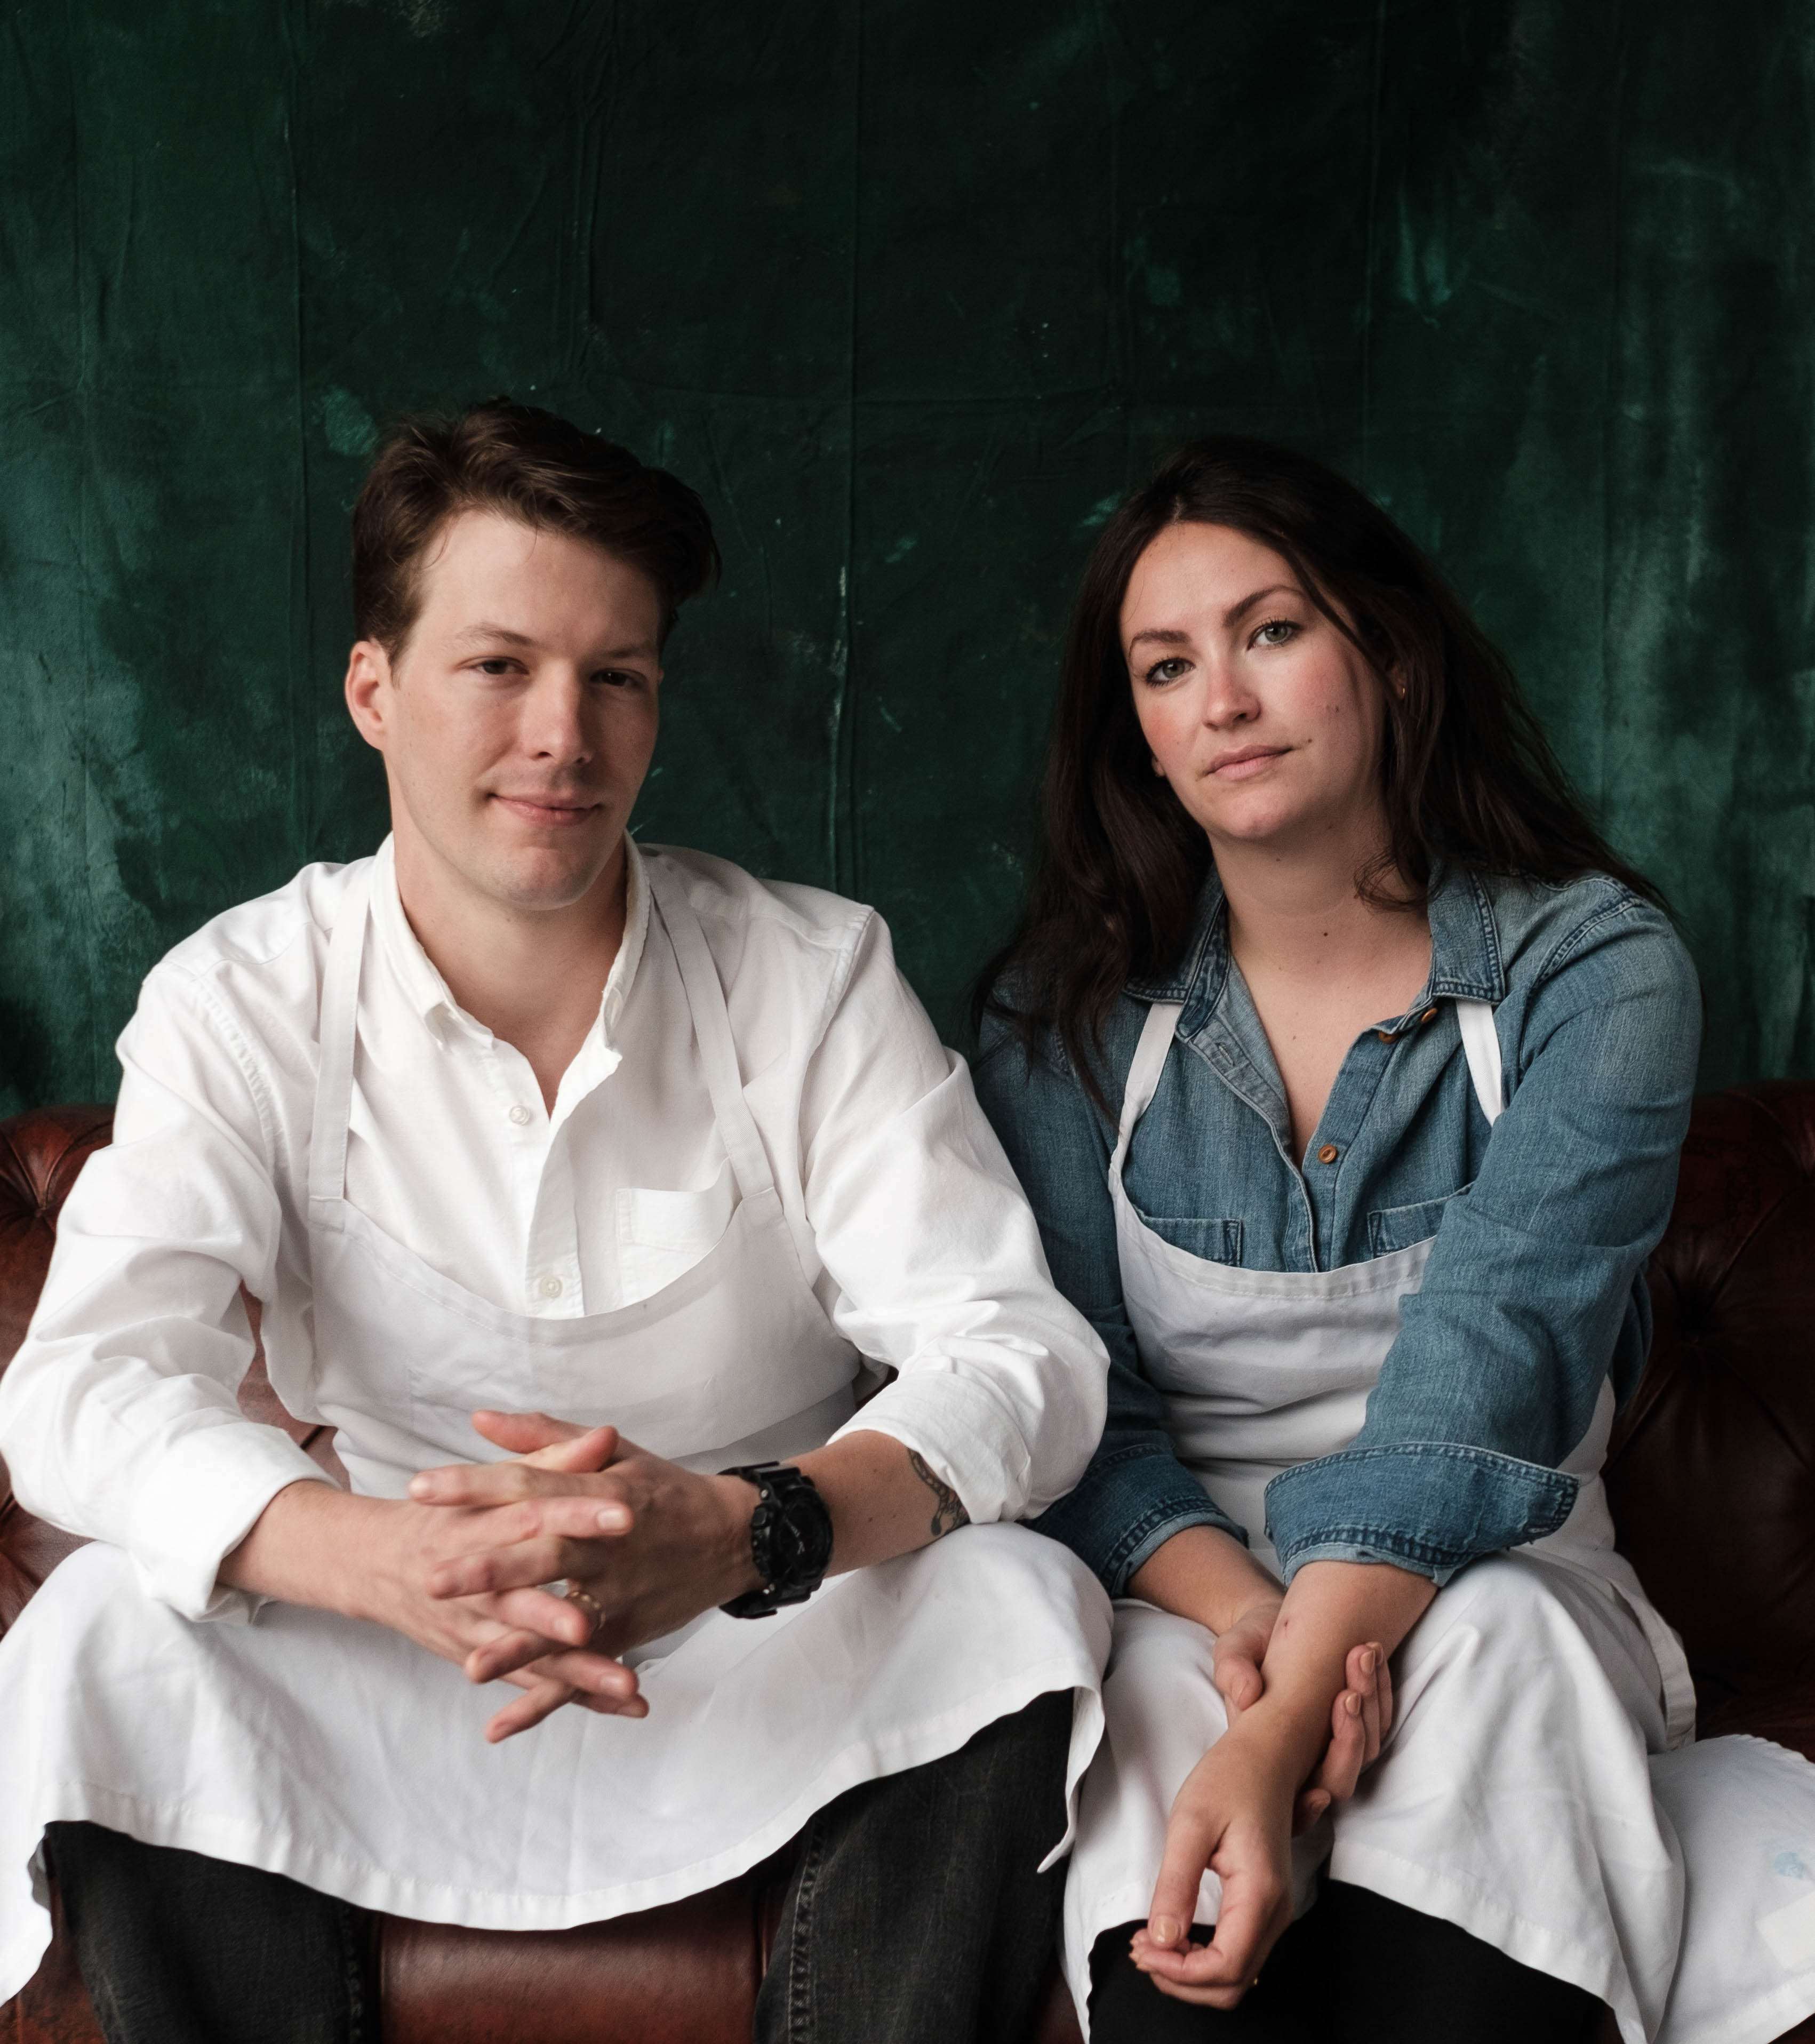 Lutie's chefs Bradley Nicholson and Susana Querejazu